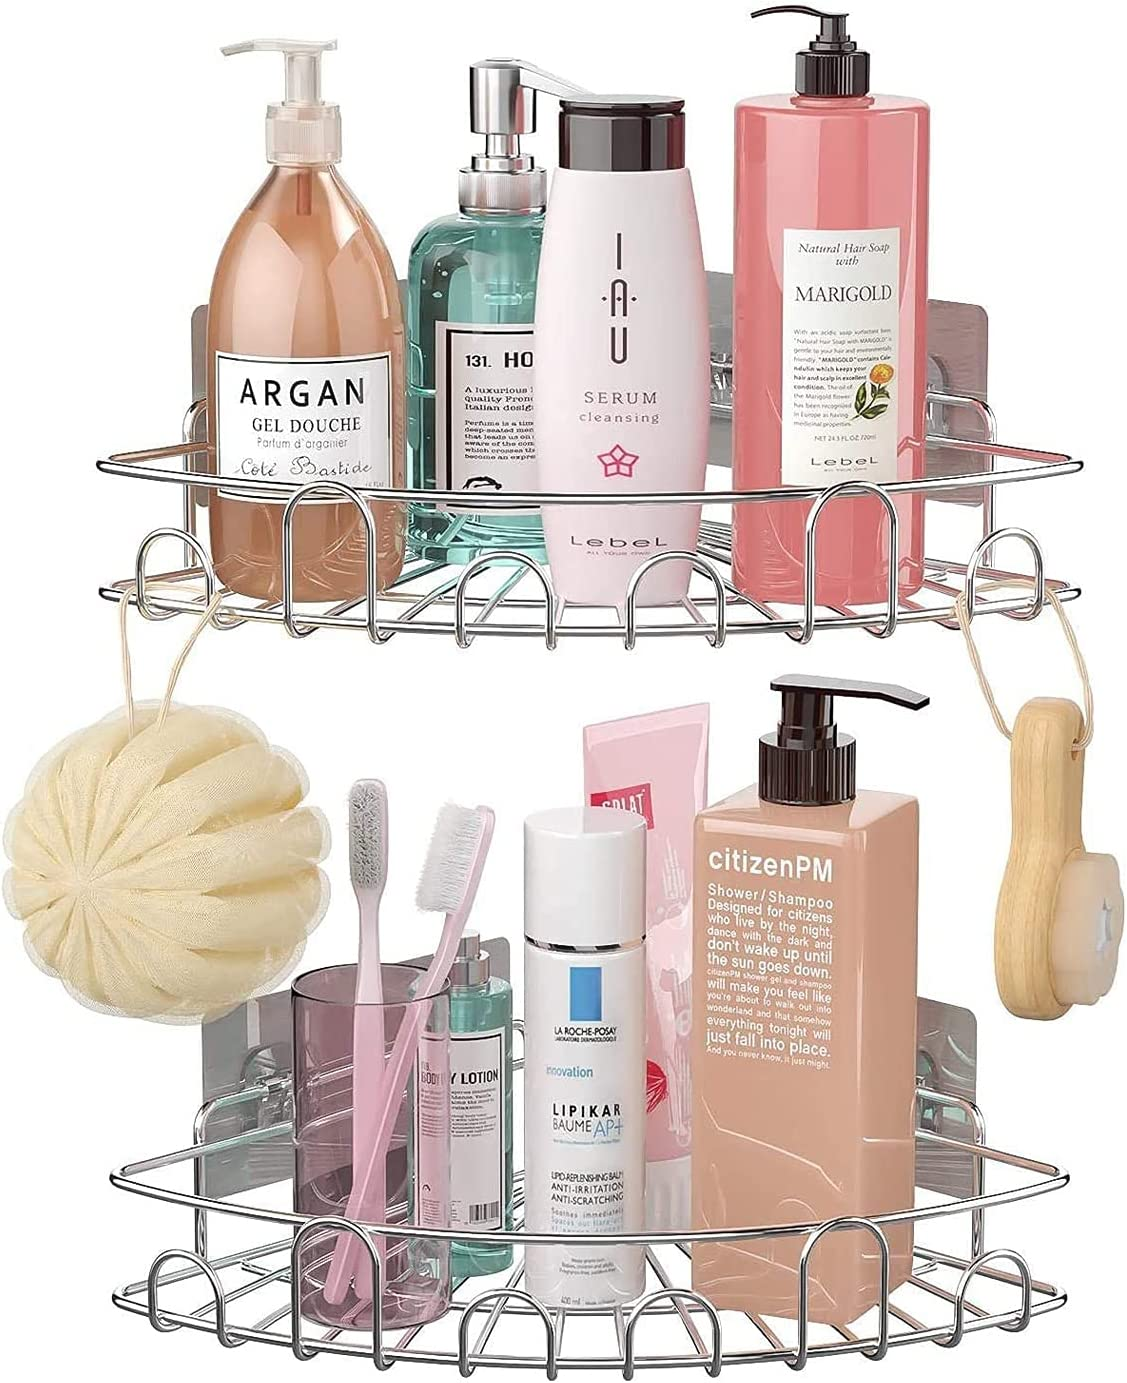 LYANXI Shower Corner Shelf 2 Drill No Bathroom Kansas City Mall Direct stock discount Showe Pack